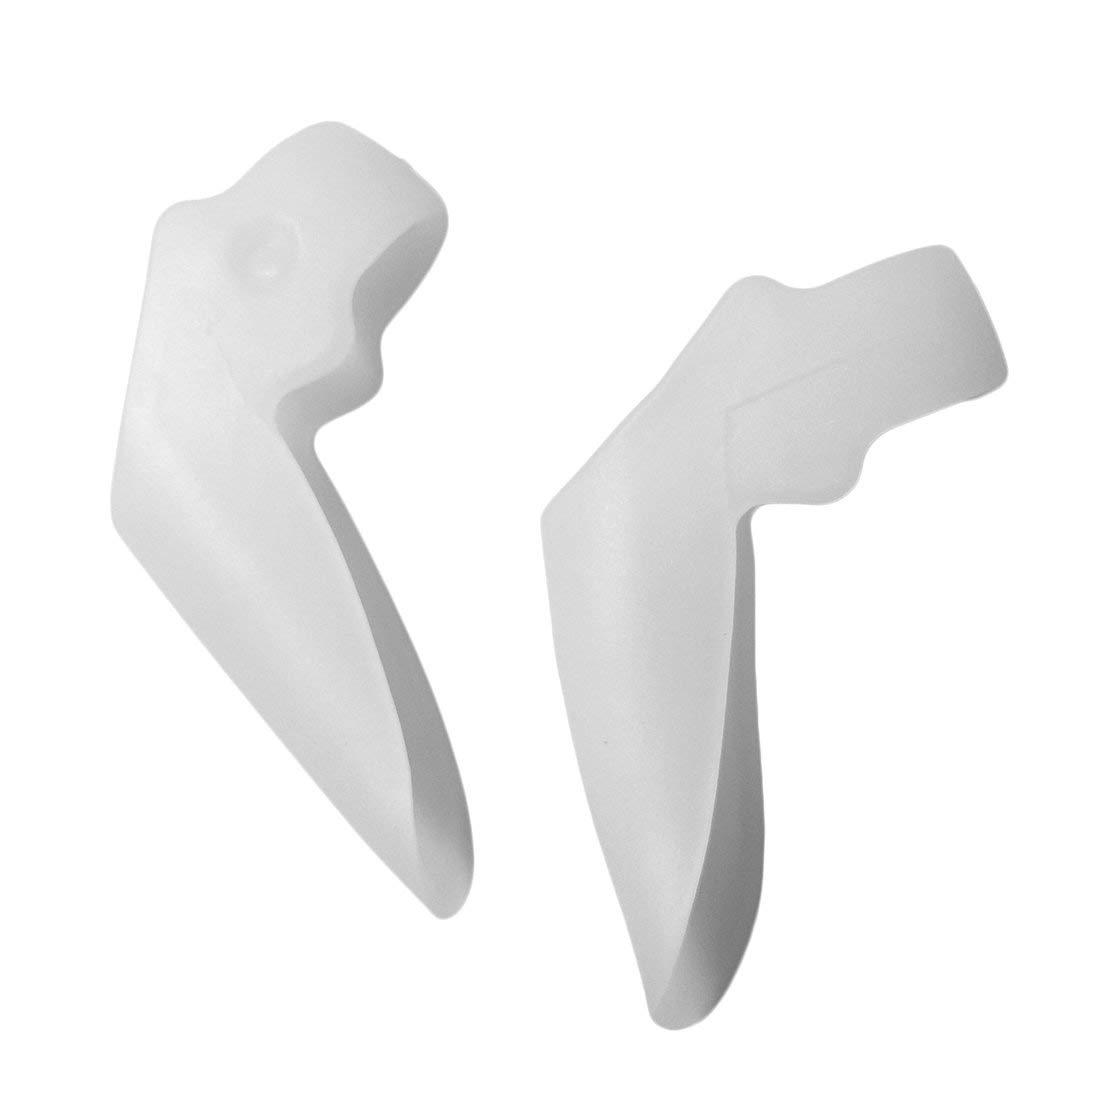 Baynne 4pcs/2Lot Genuine special hallux valgus bicyclic thumb orthopedic braces to correct orthotics daily silicone toe big bone